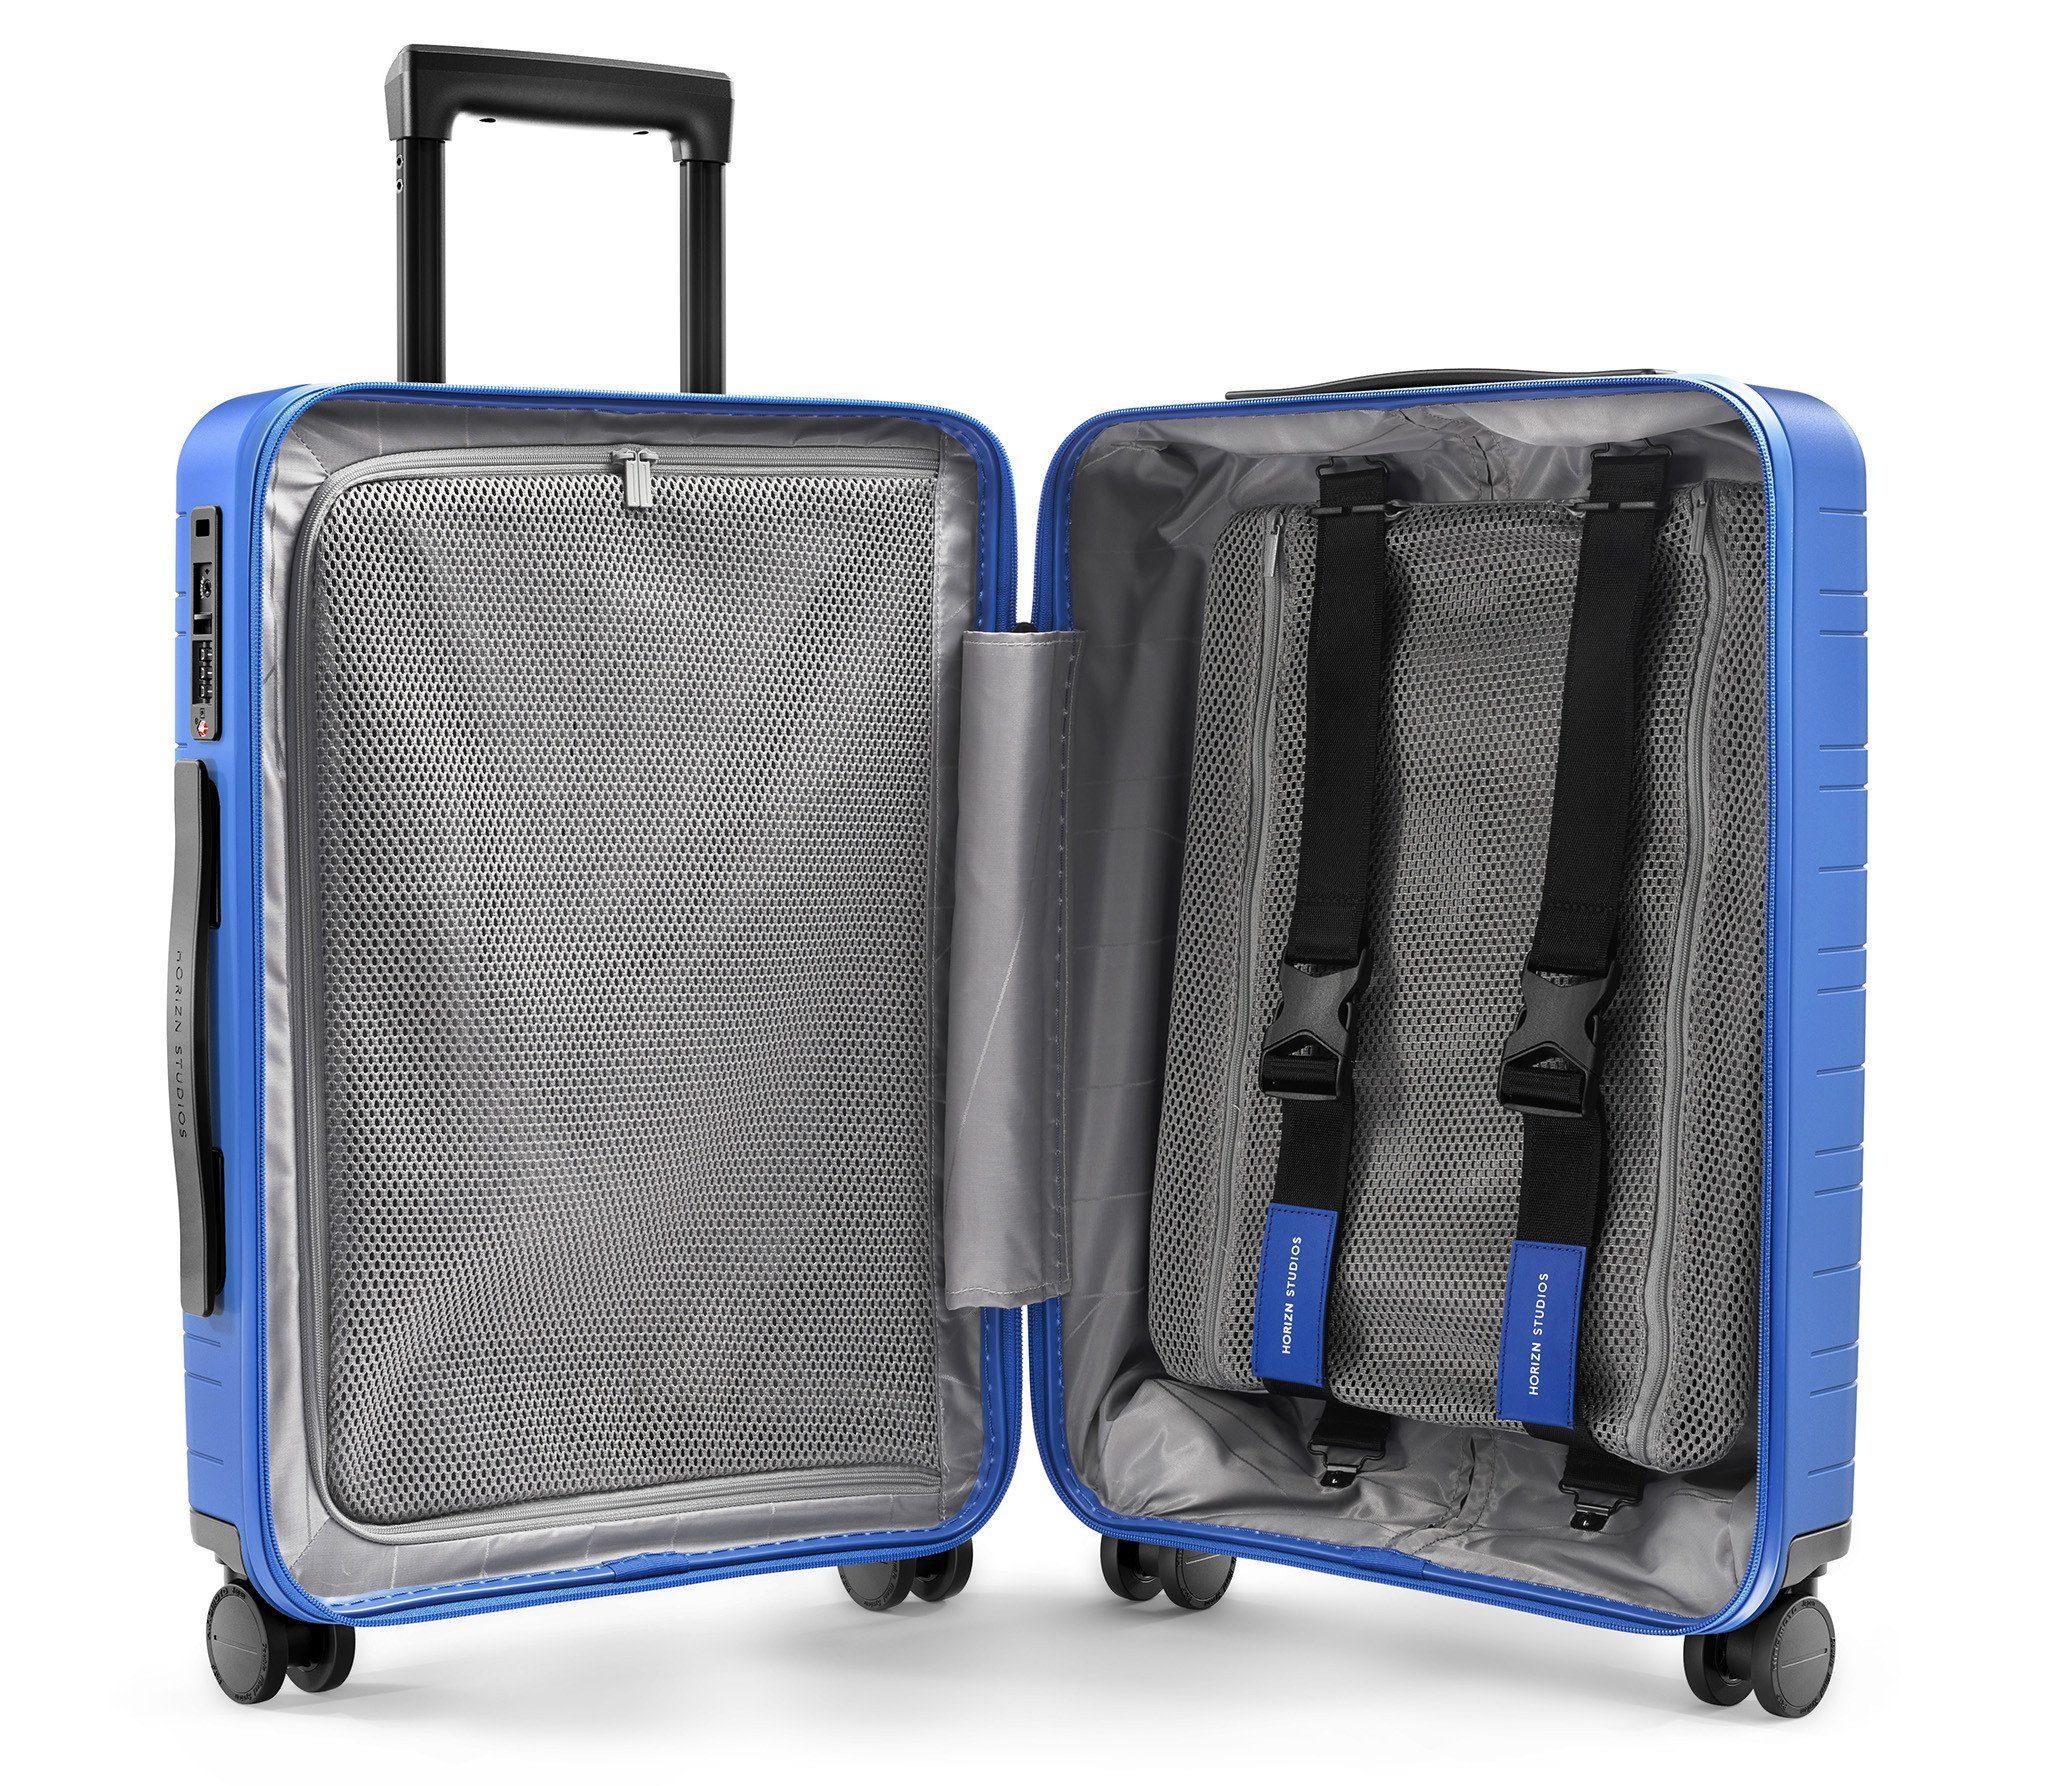 Horizn Studios smart luggage